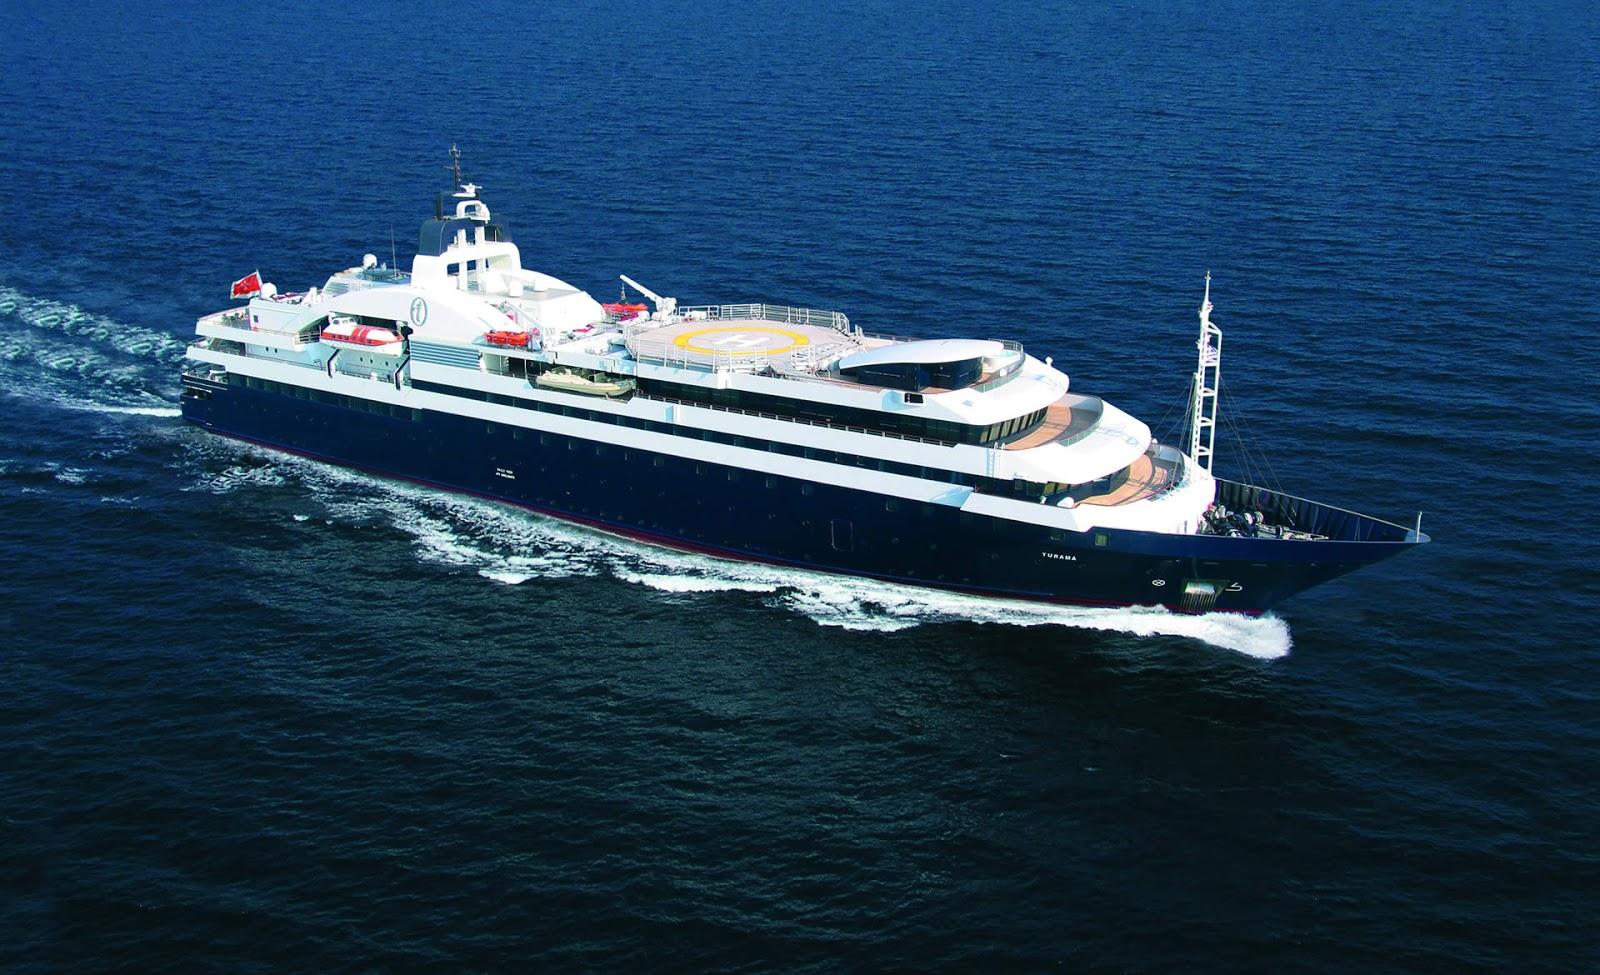 Turama Superyacht